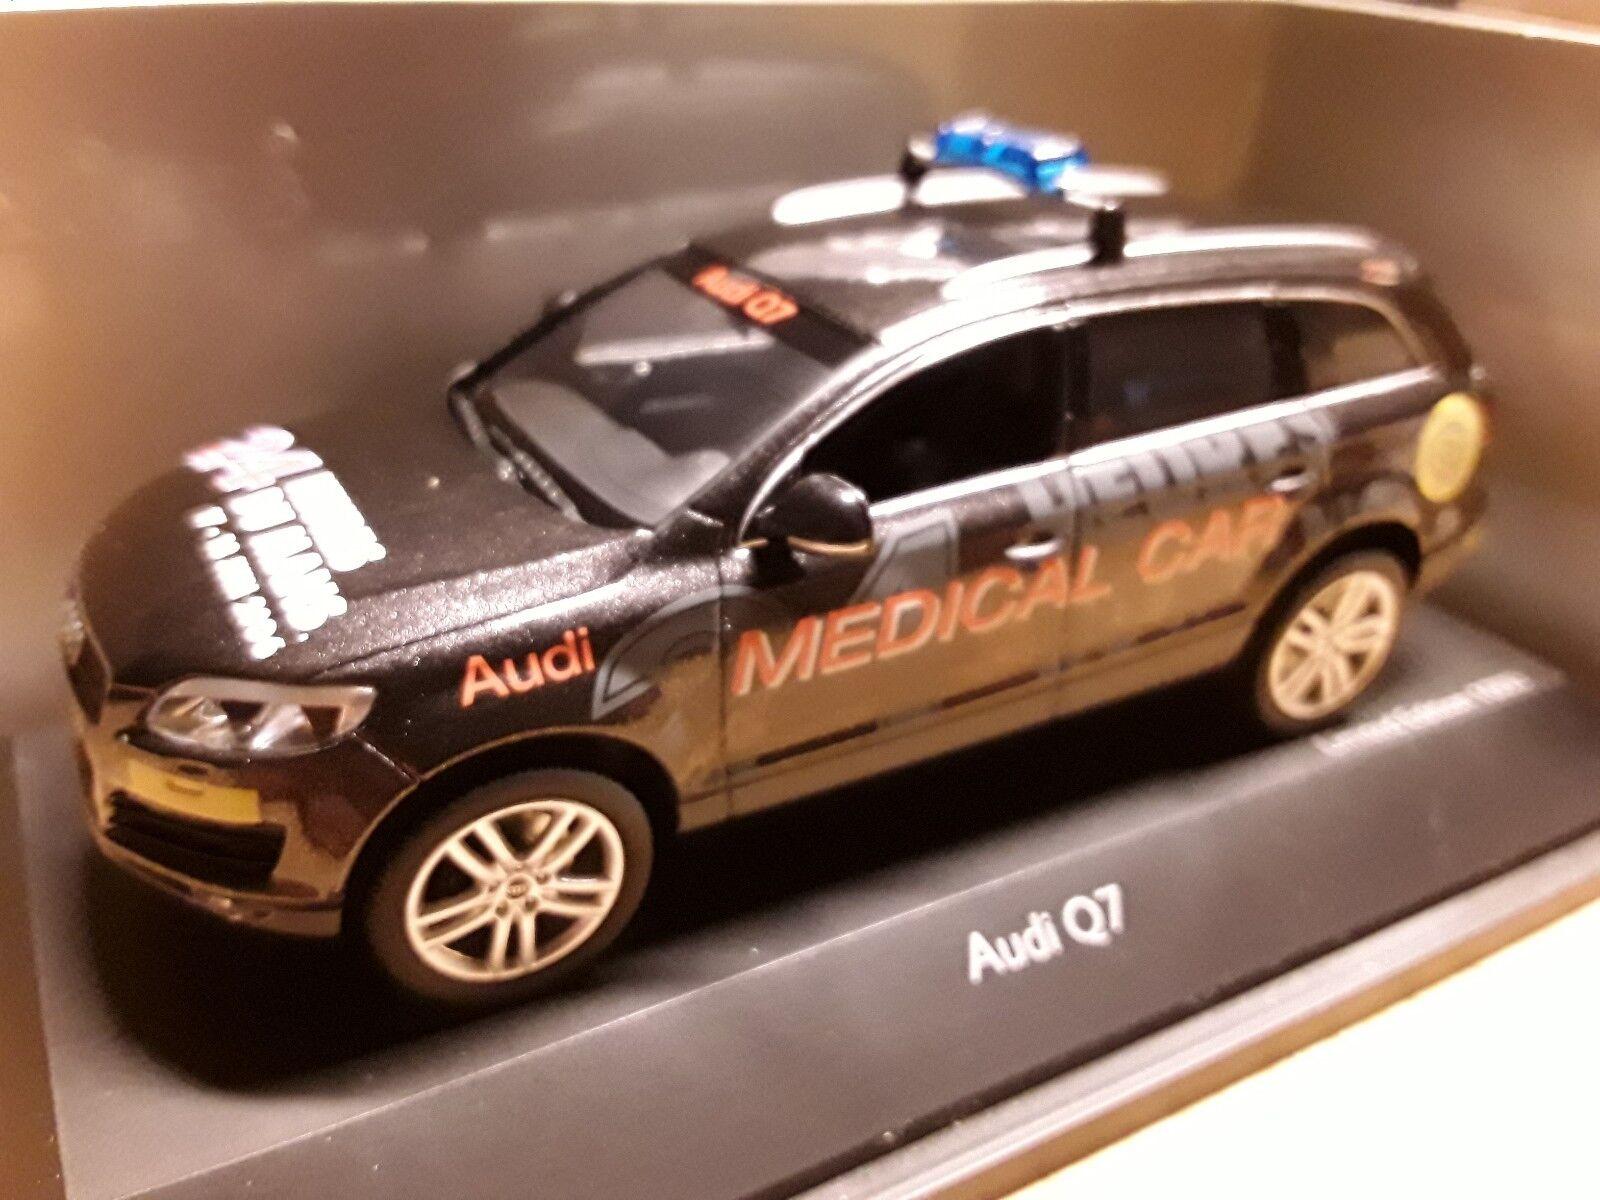 Audi Q7    Medical Car  1 43 Schuco  450475500 3c717f